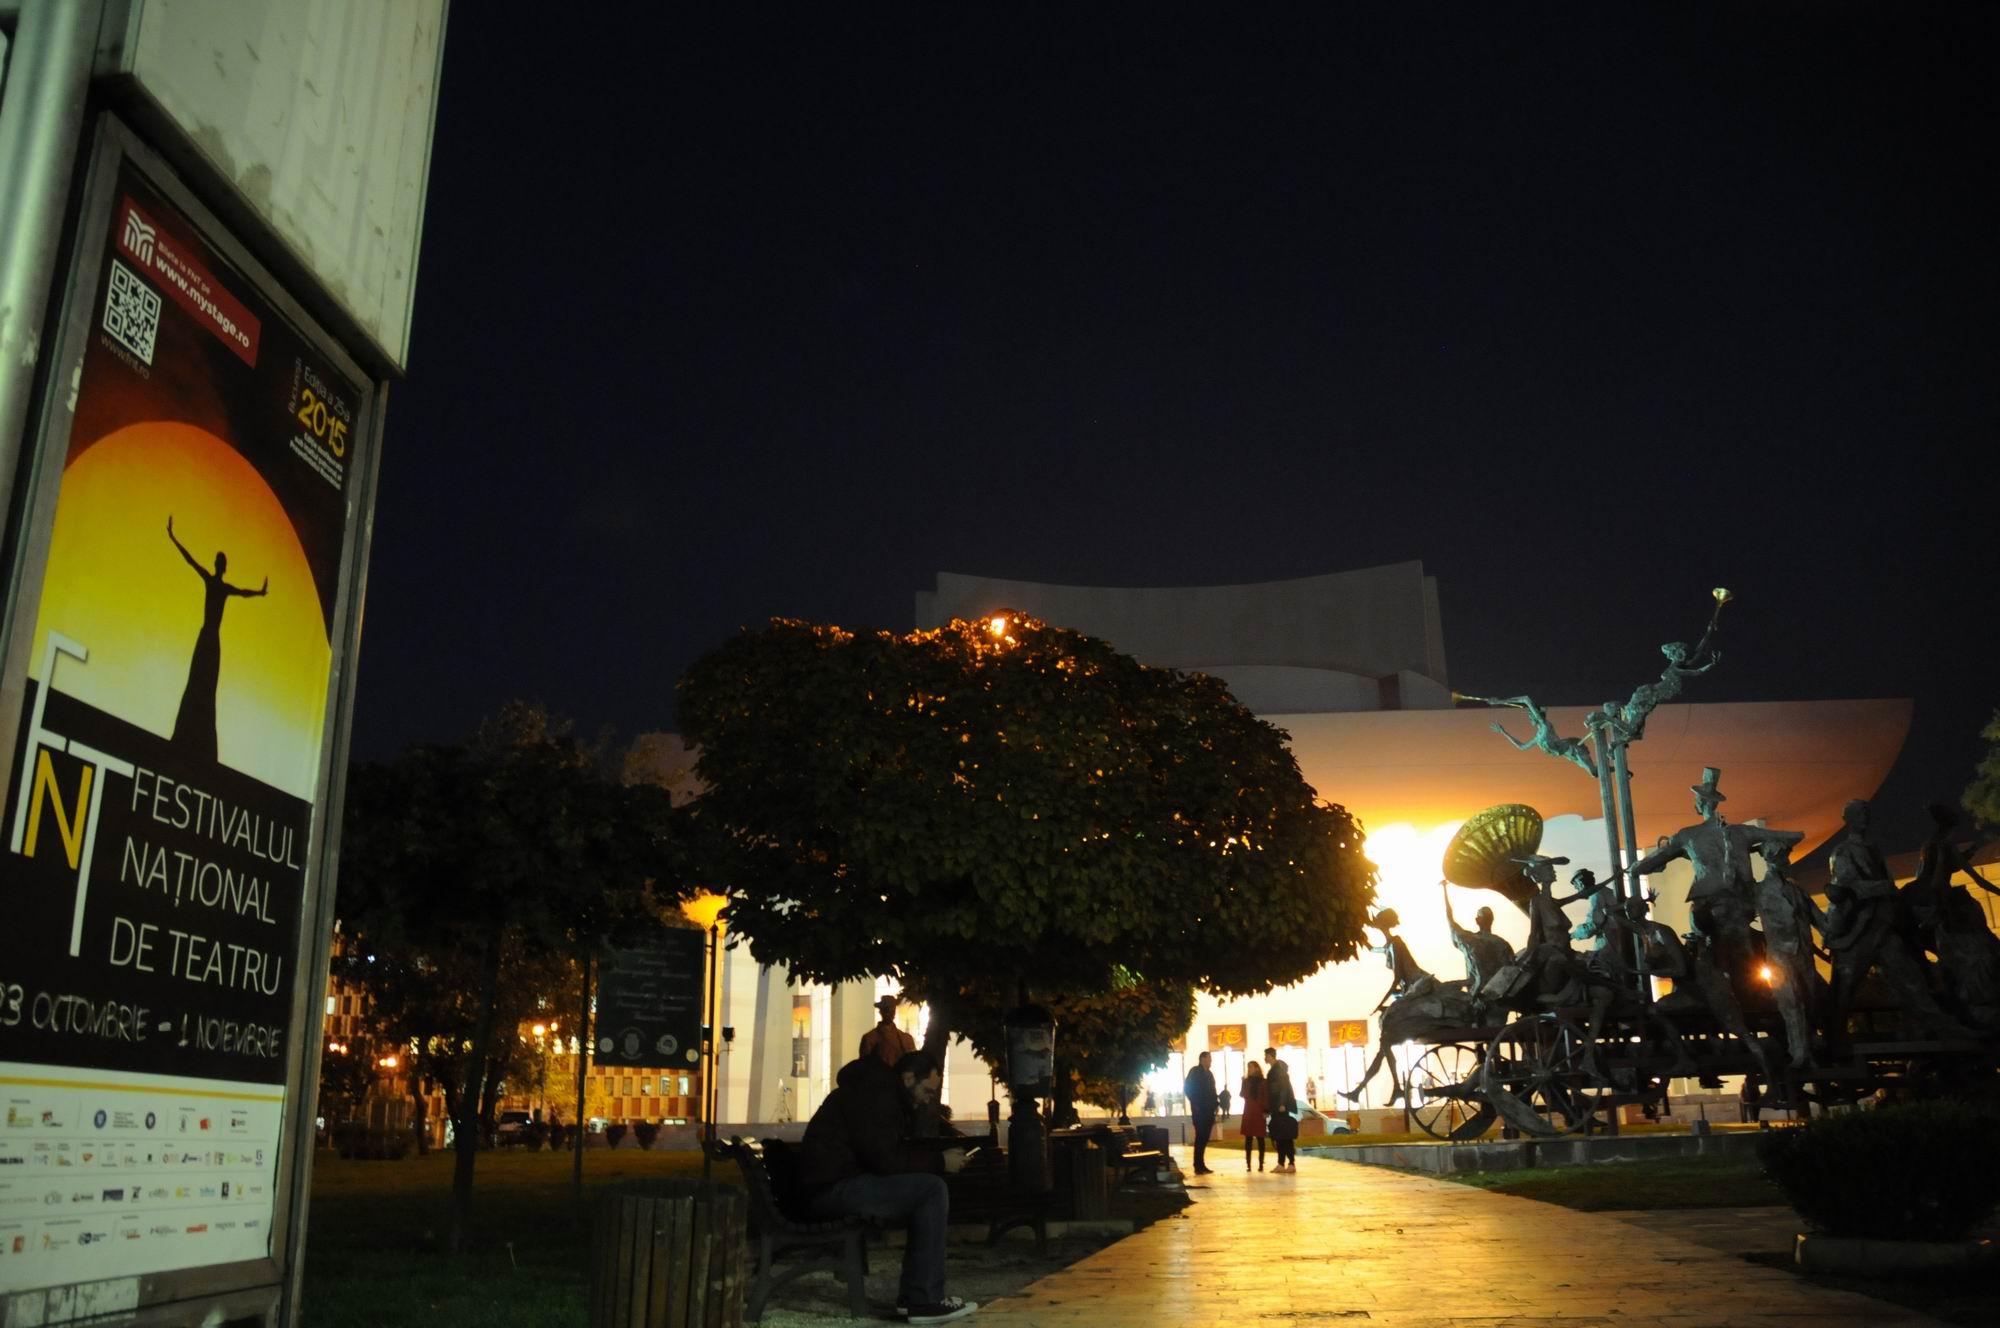 FNT 2015 - deschiderea oficiala TNB foto Lucian Muntean _0001